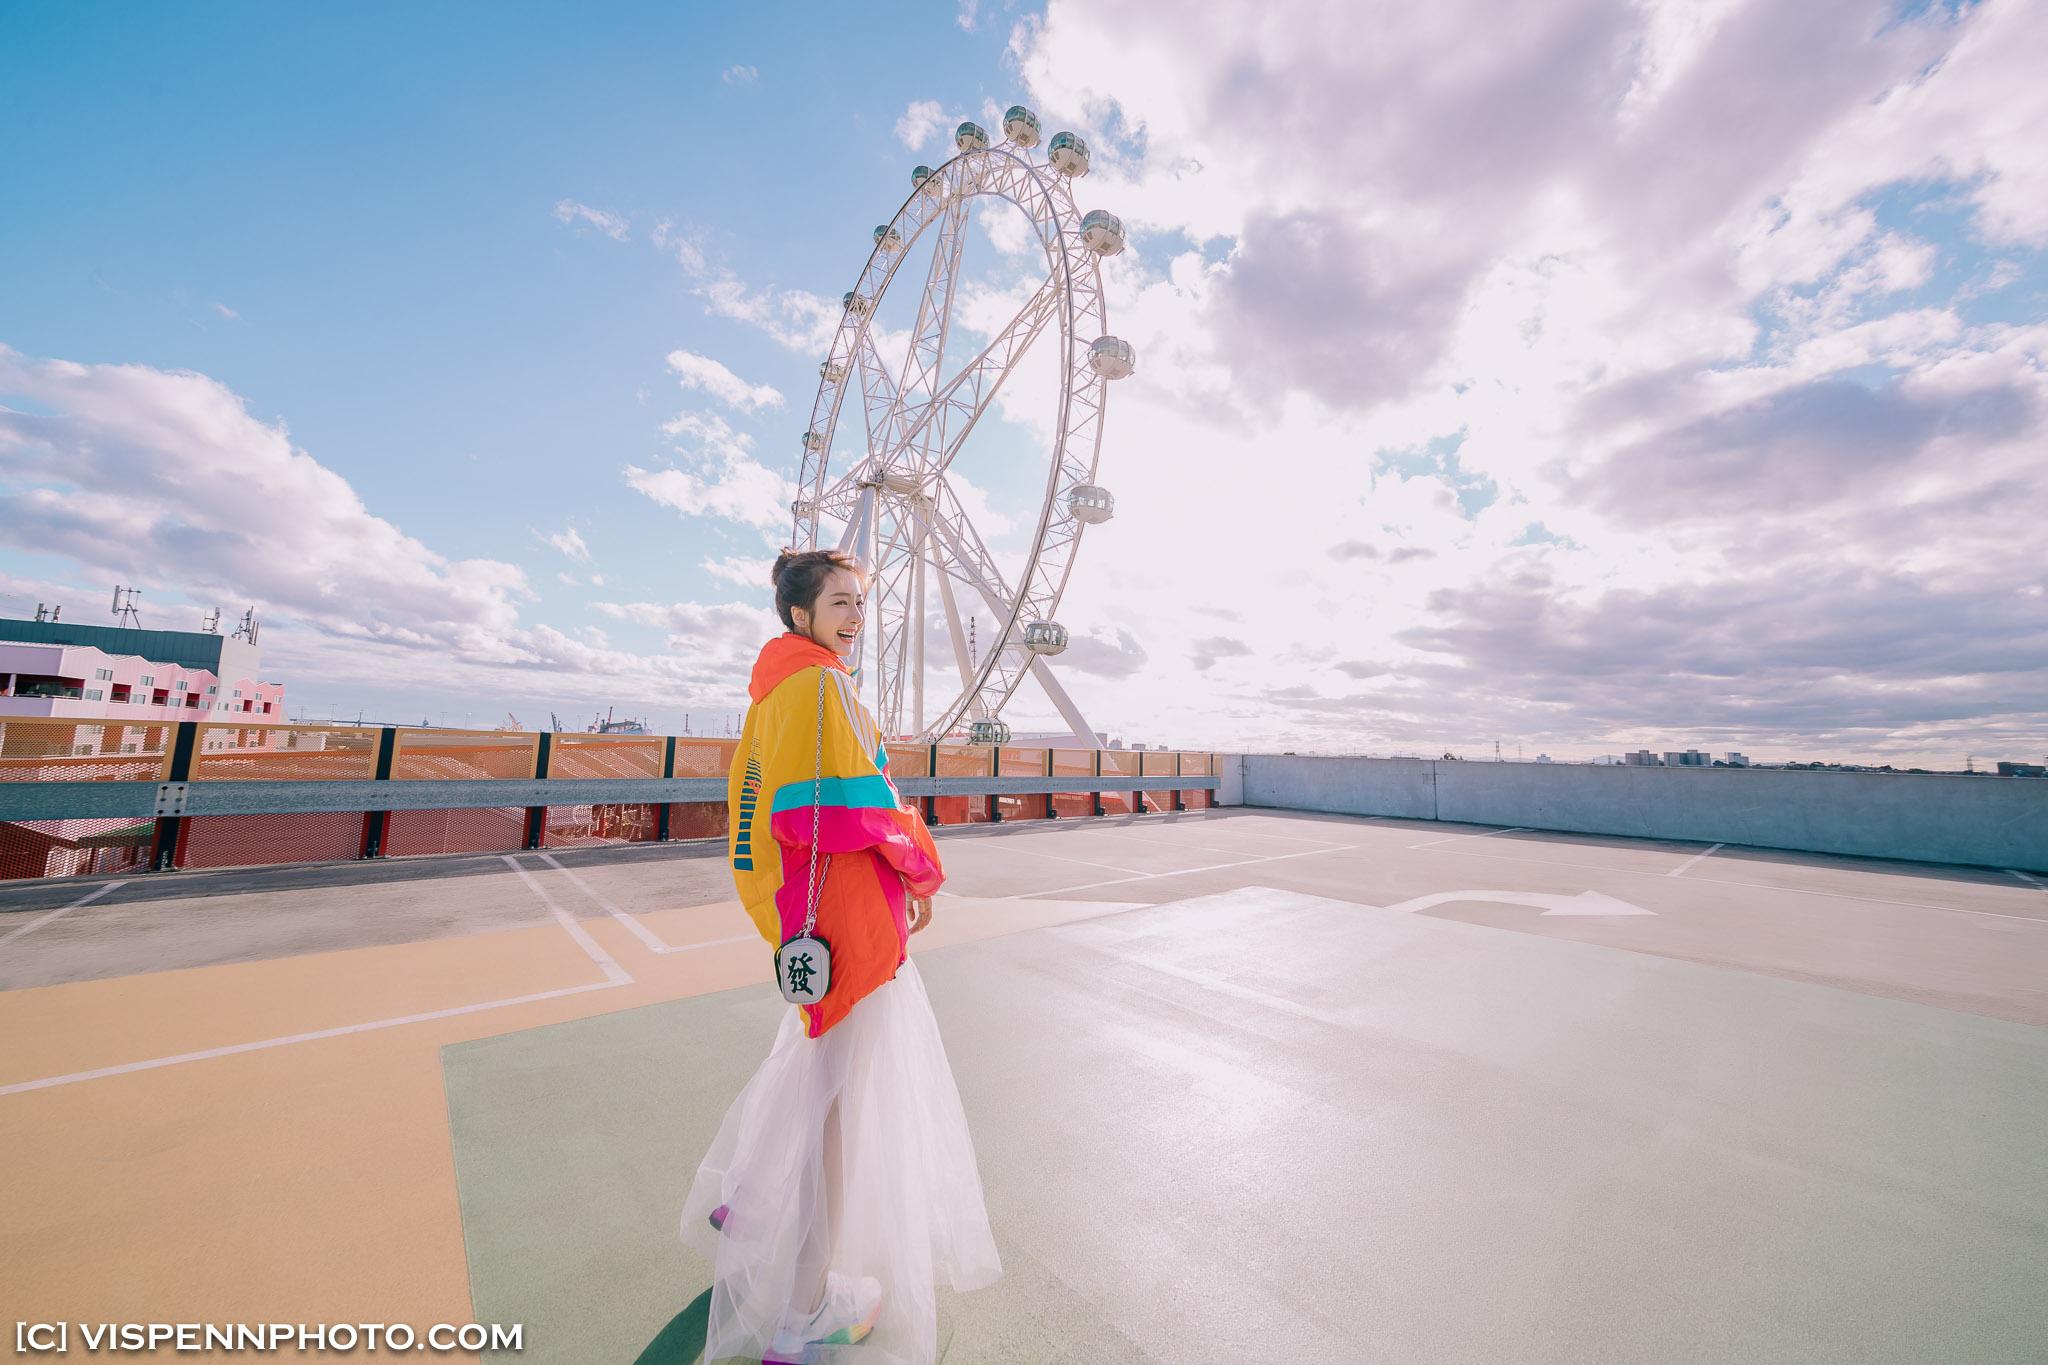 Melbourne Fashion Portrait Commercial Photography VISPENN 墨尔本 服装 商业 人像 摄影 LiYiXiao 2P 3692 1DX VISPENN